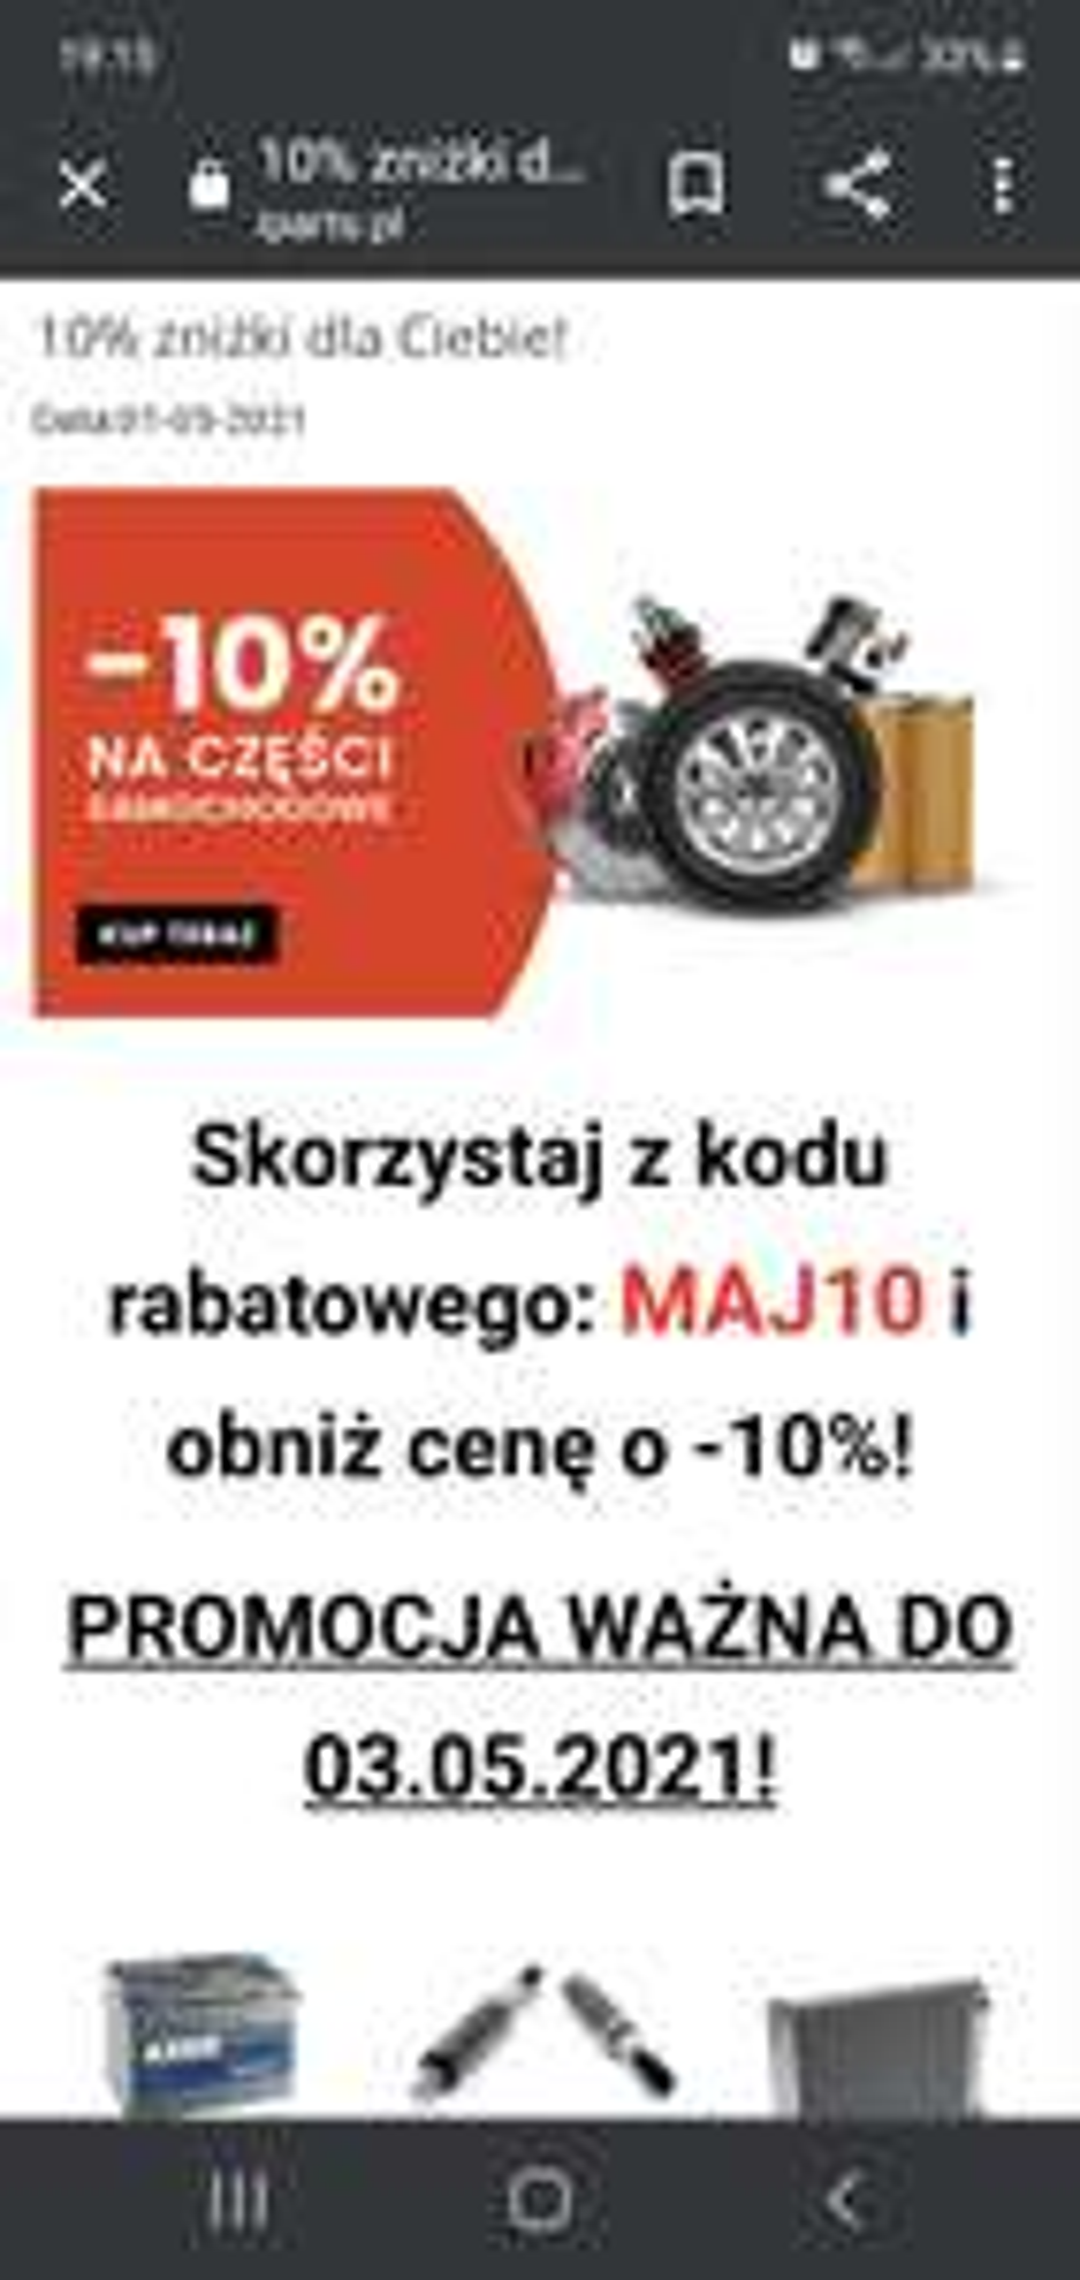 Rabat 10% na cały asortyment w iparts